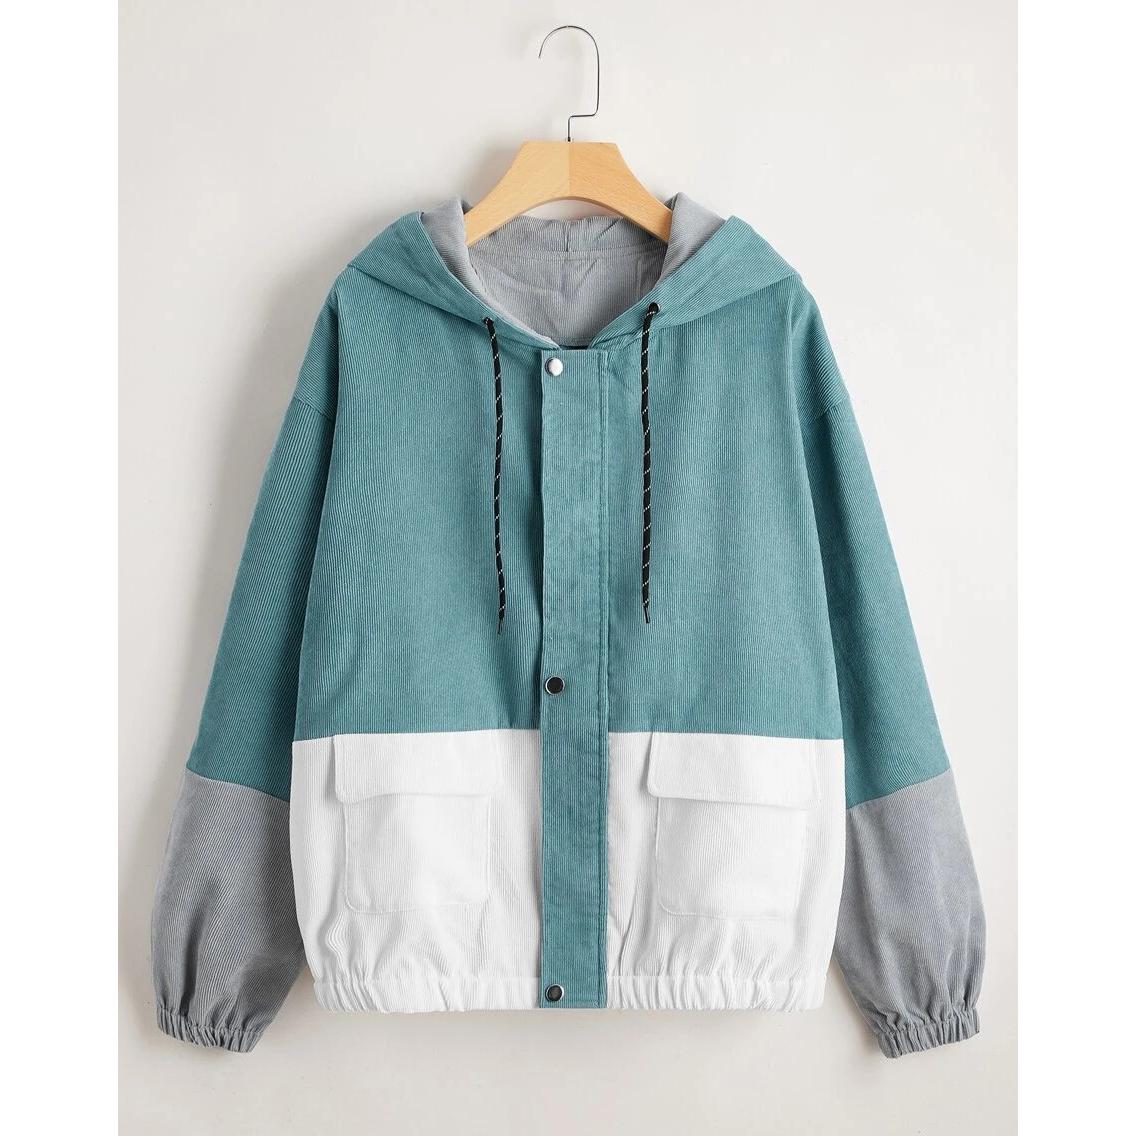 SHEIN Cut And Sew Flap Pocket Corduroy Jacket